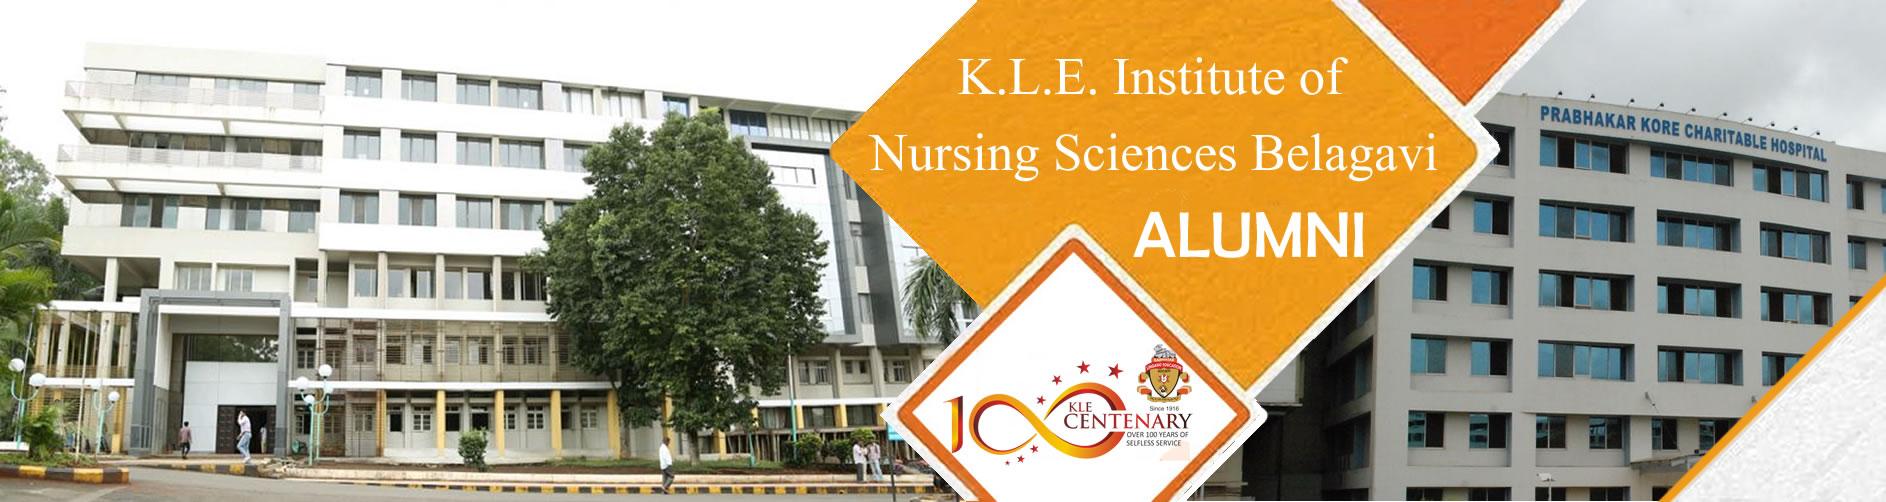 K.L.E Nursing Belgaum – Alumni